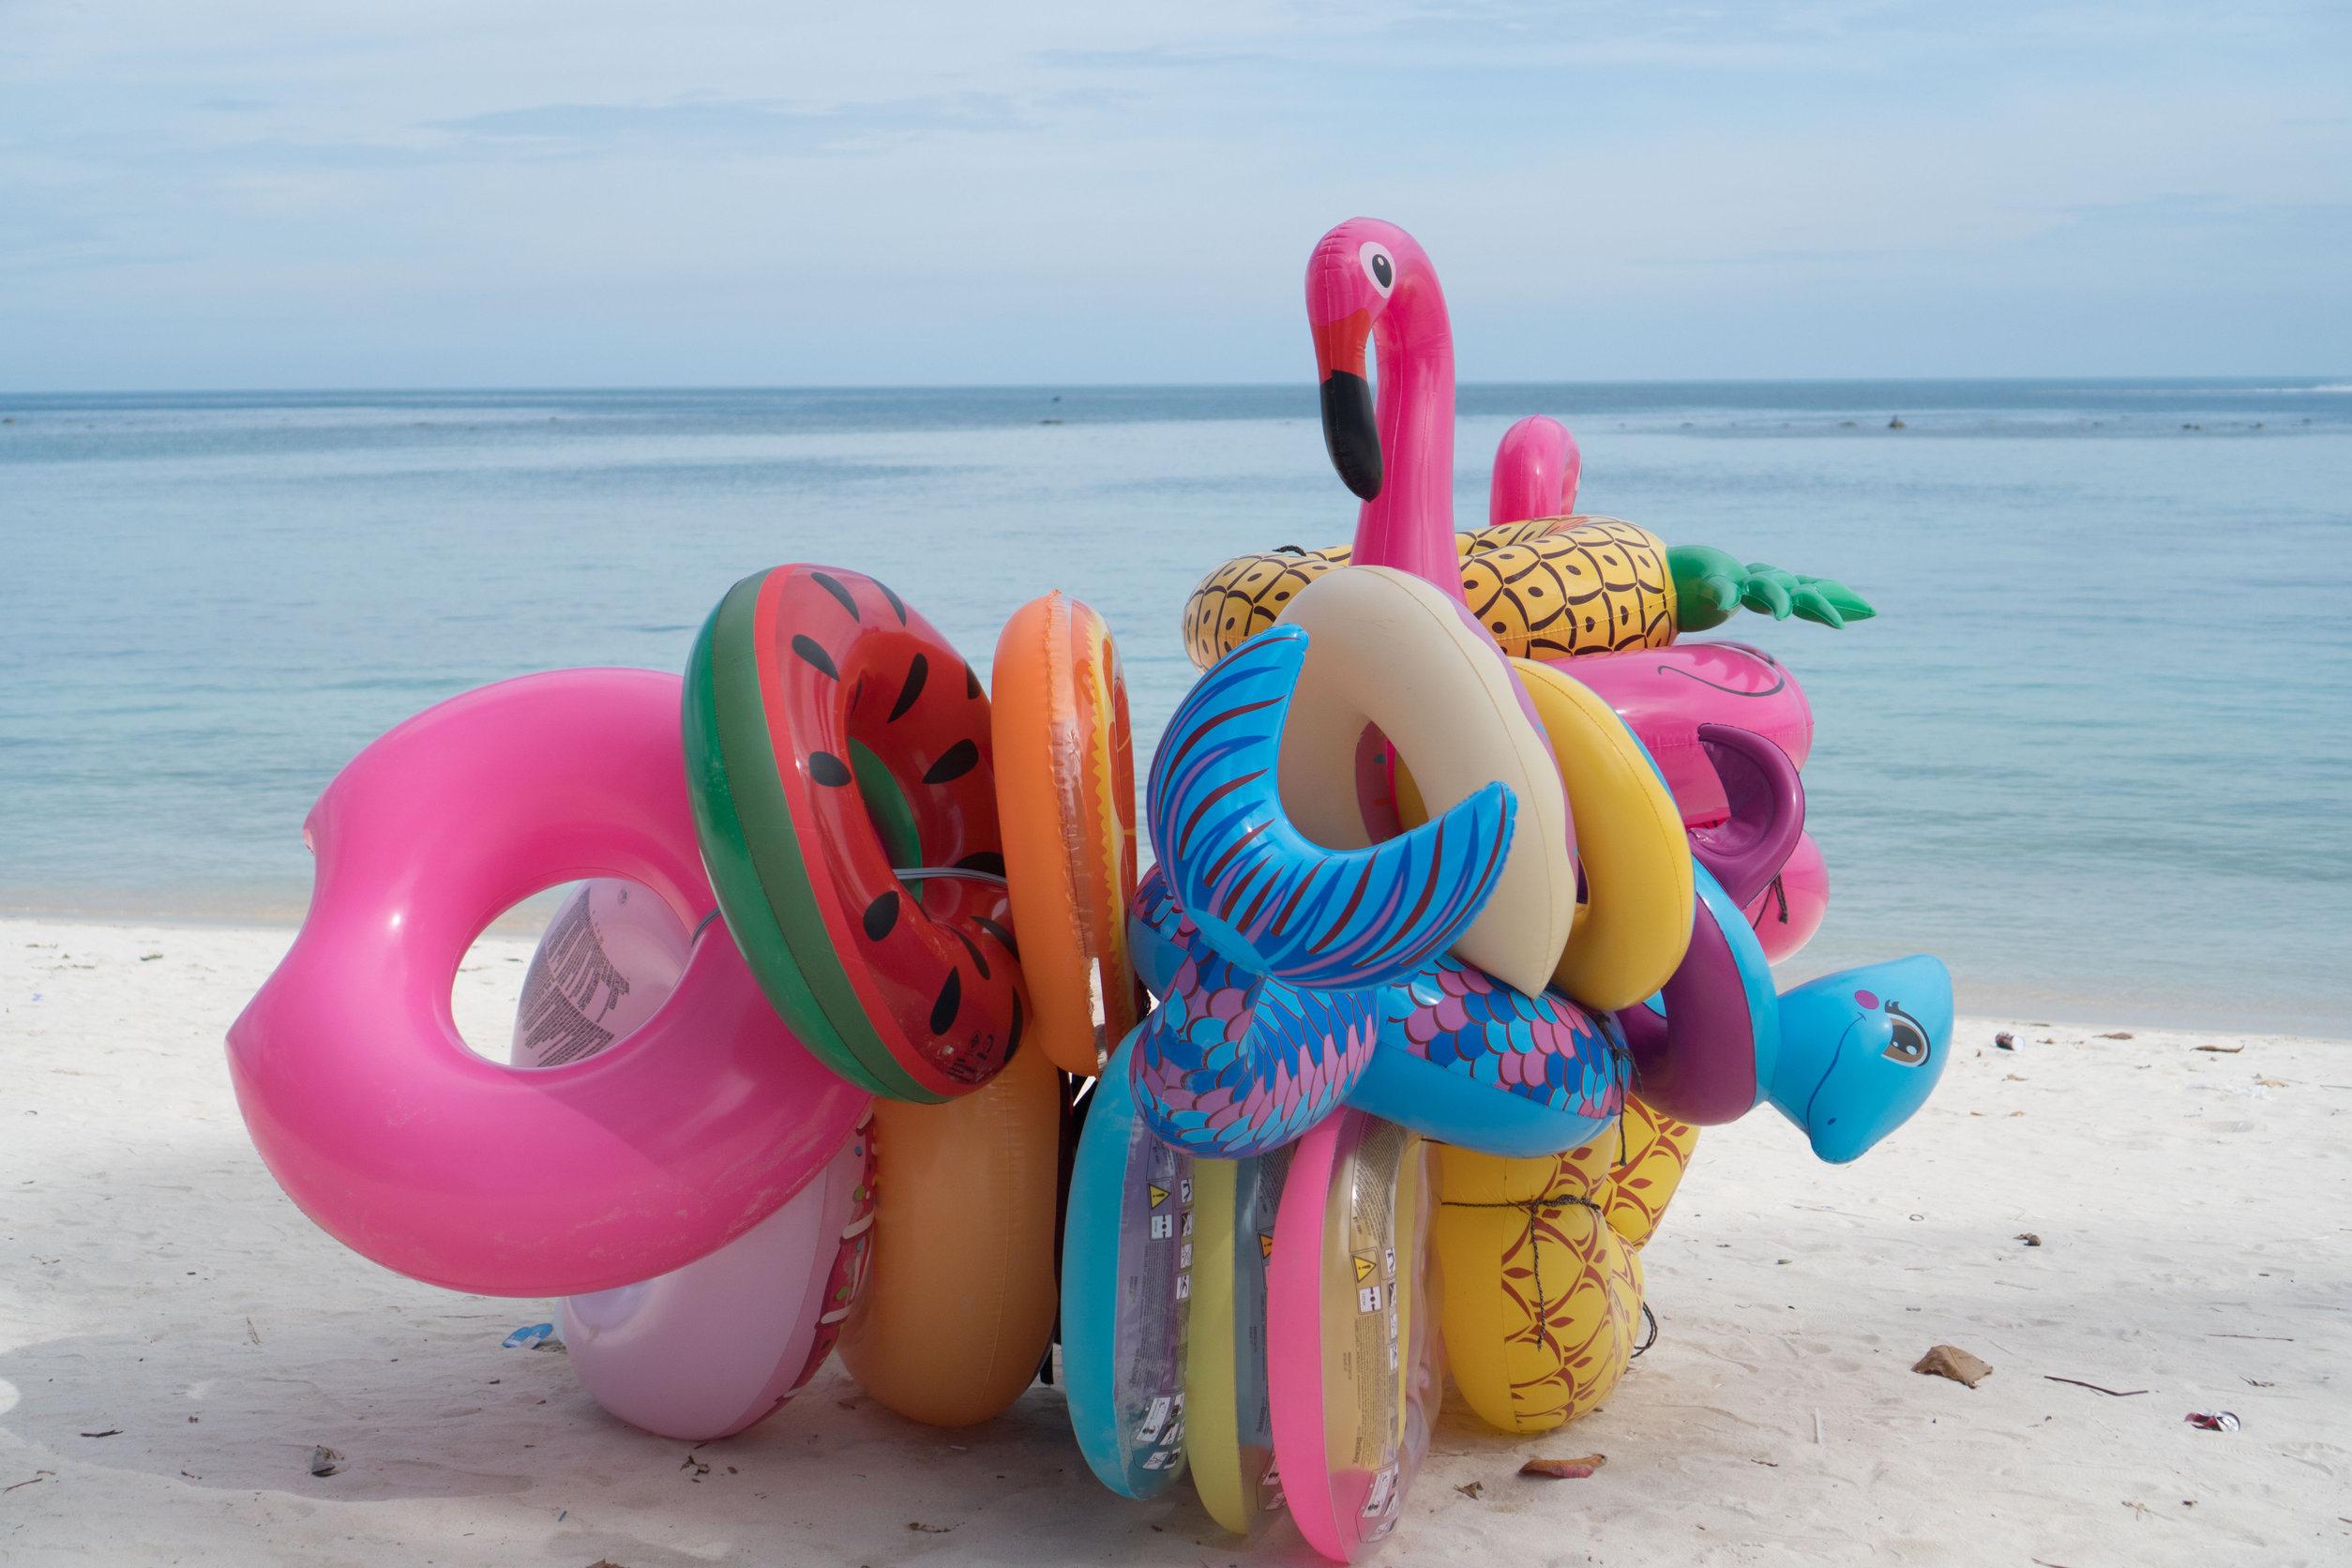 fun floats for the beach